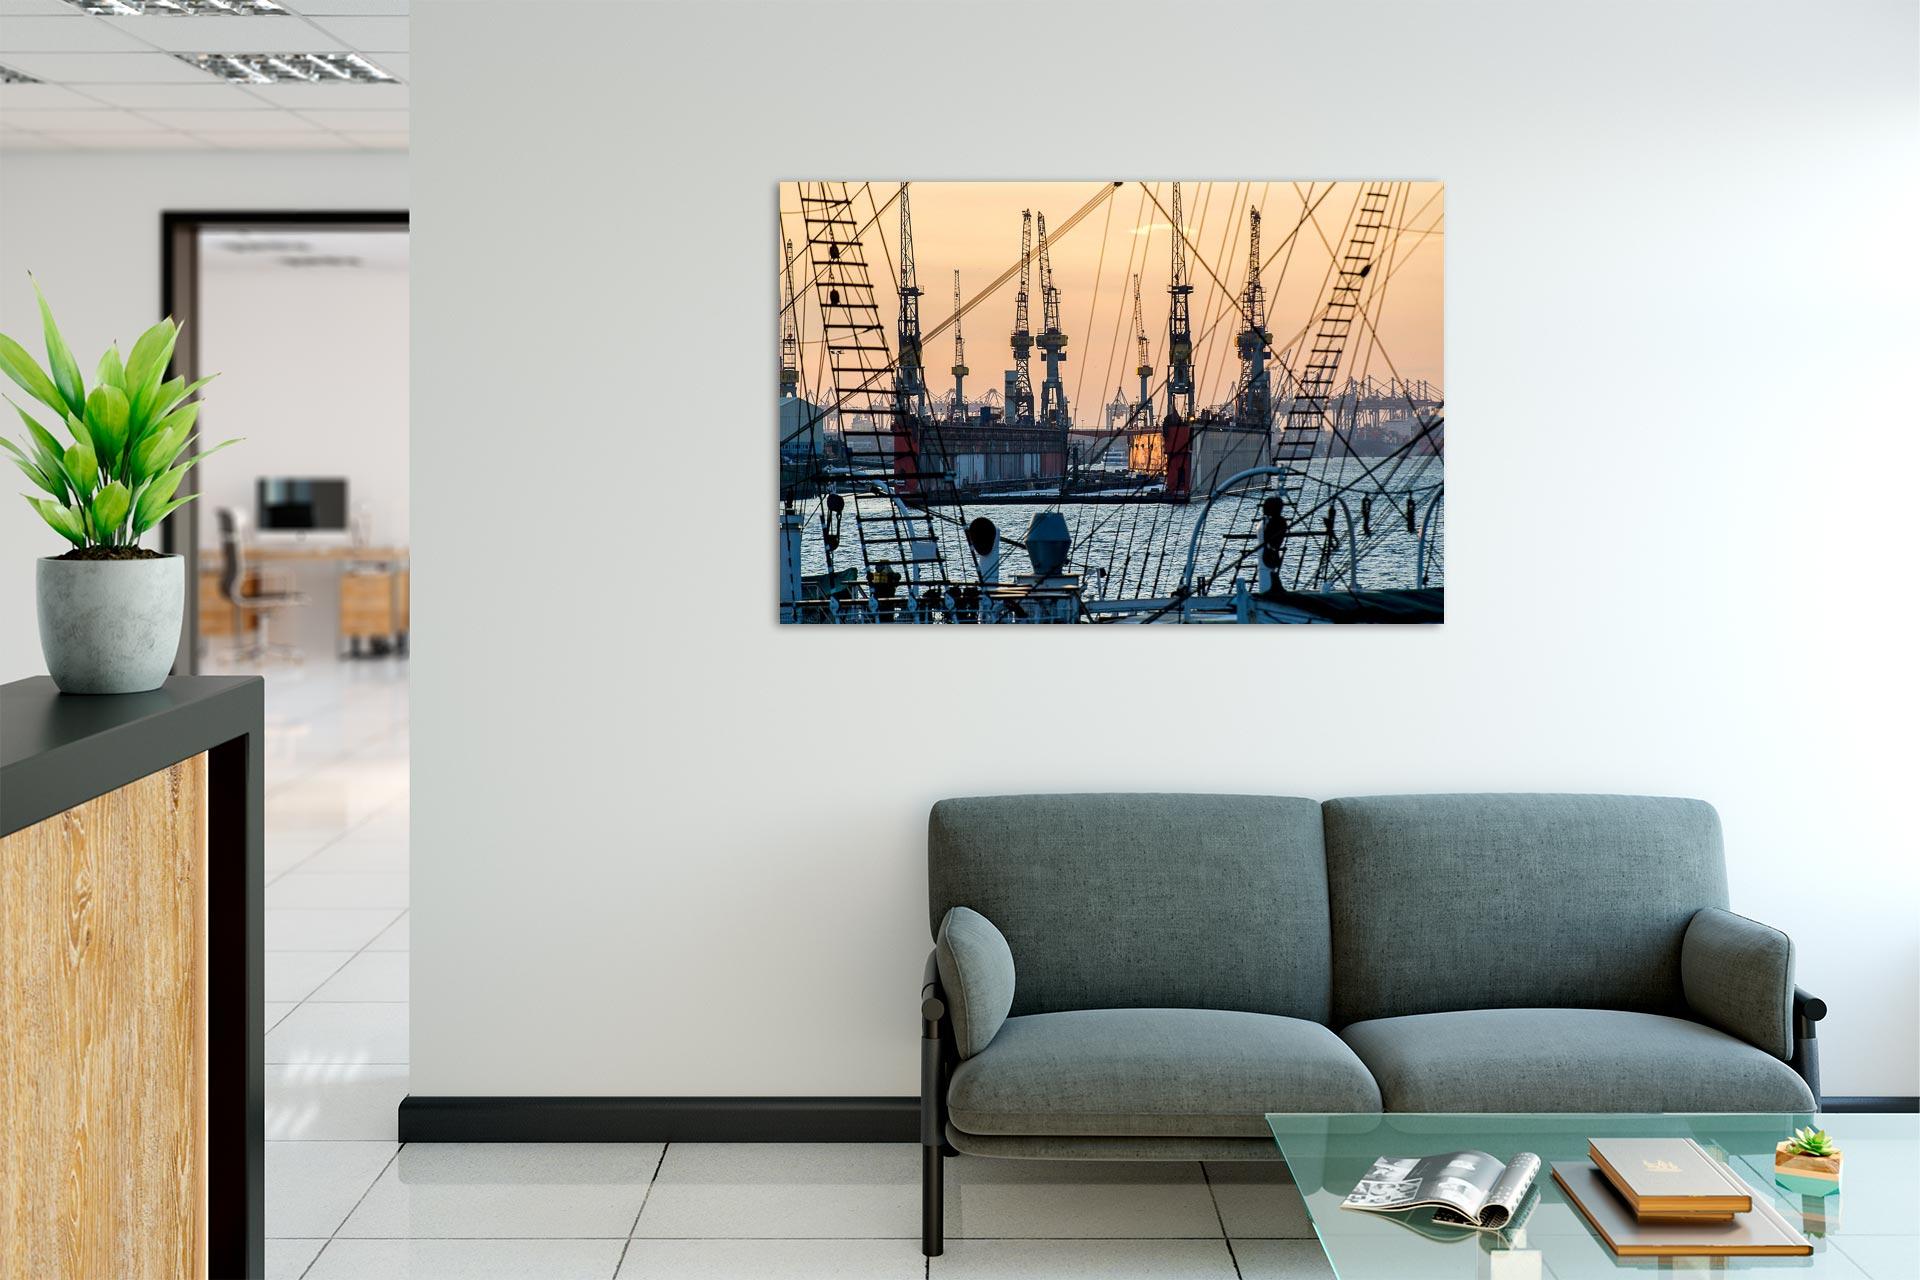 LCW156-tauwerk-wandbild-bild-auf-leinwand-acrylglas-aludibond-empfang